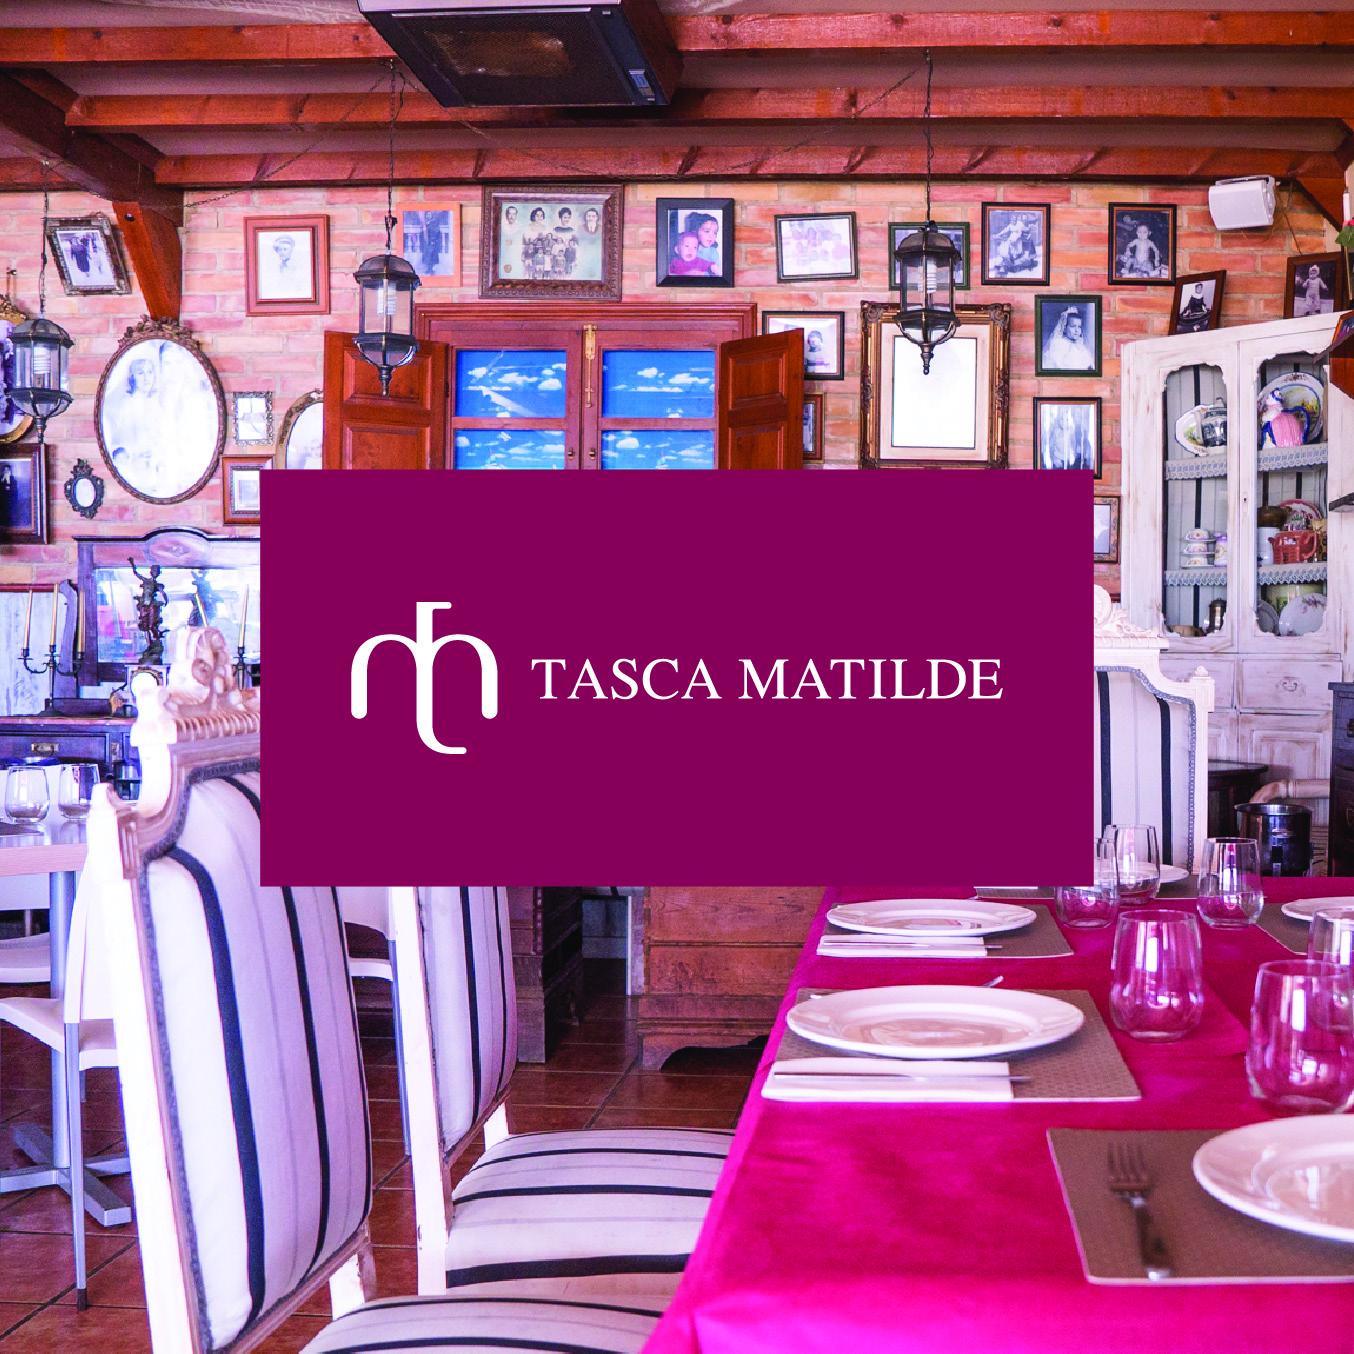 restaurante by manuel alonso. Tasca Matilde